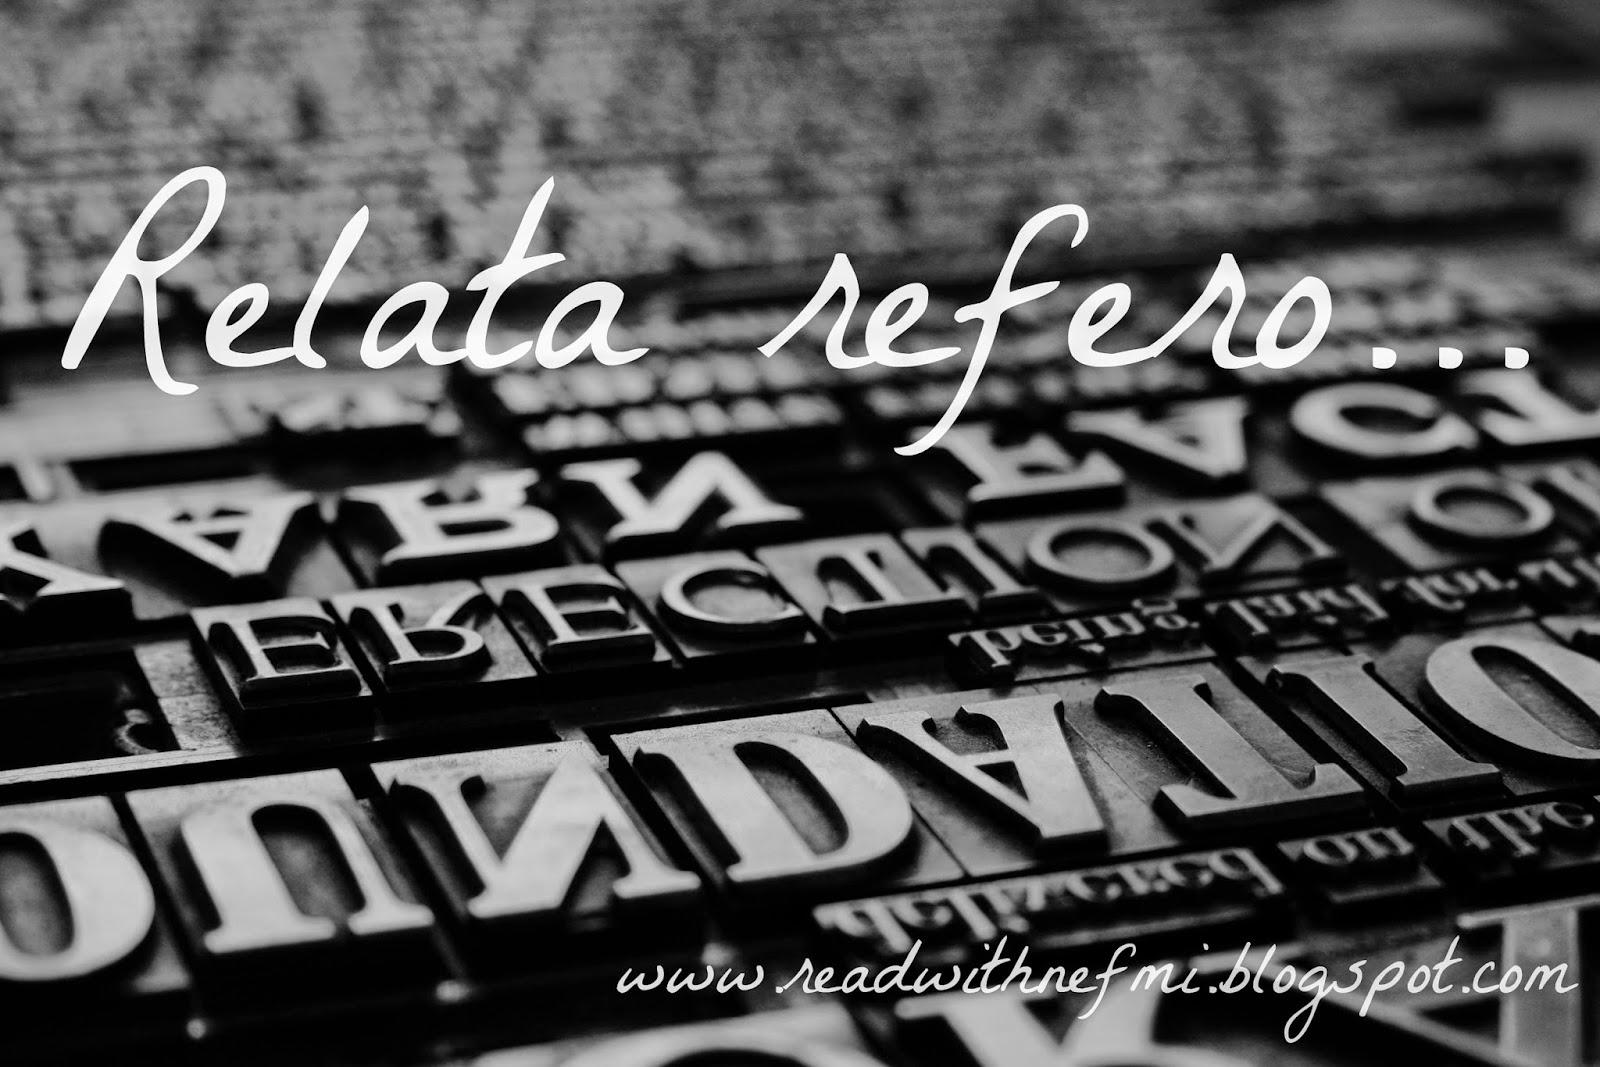 http://readwithnefmi.blogspot.com/2014/10/relata-refero-3.html